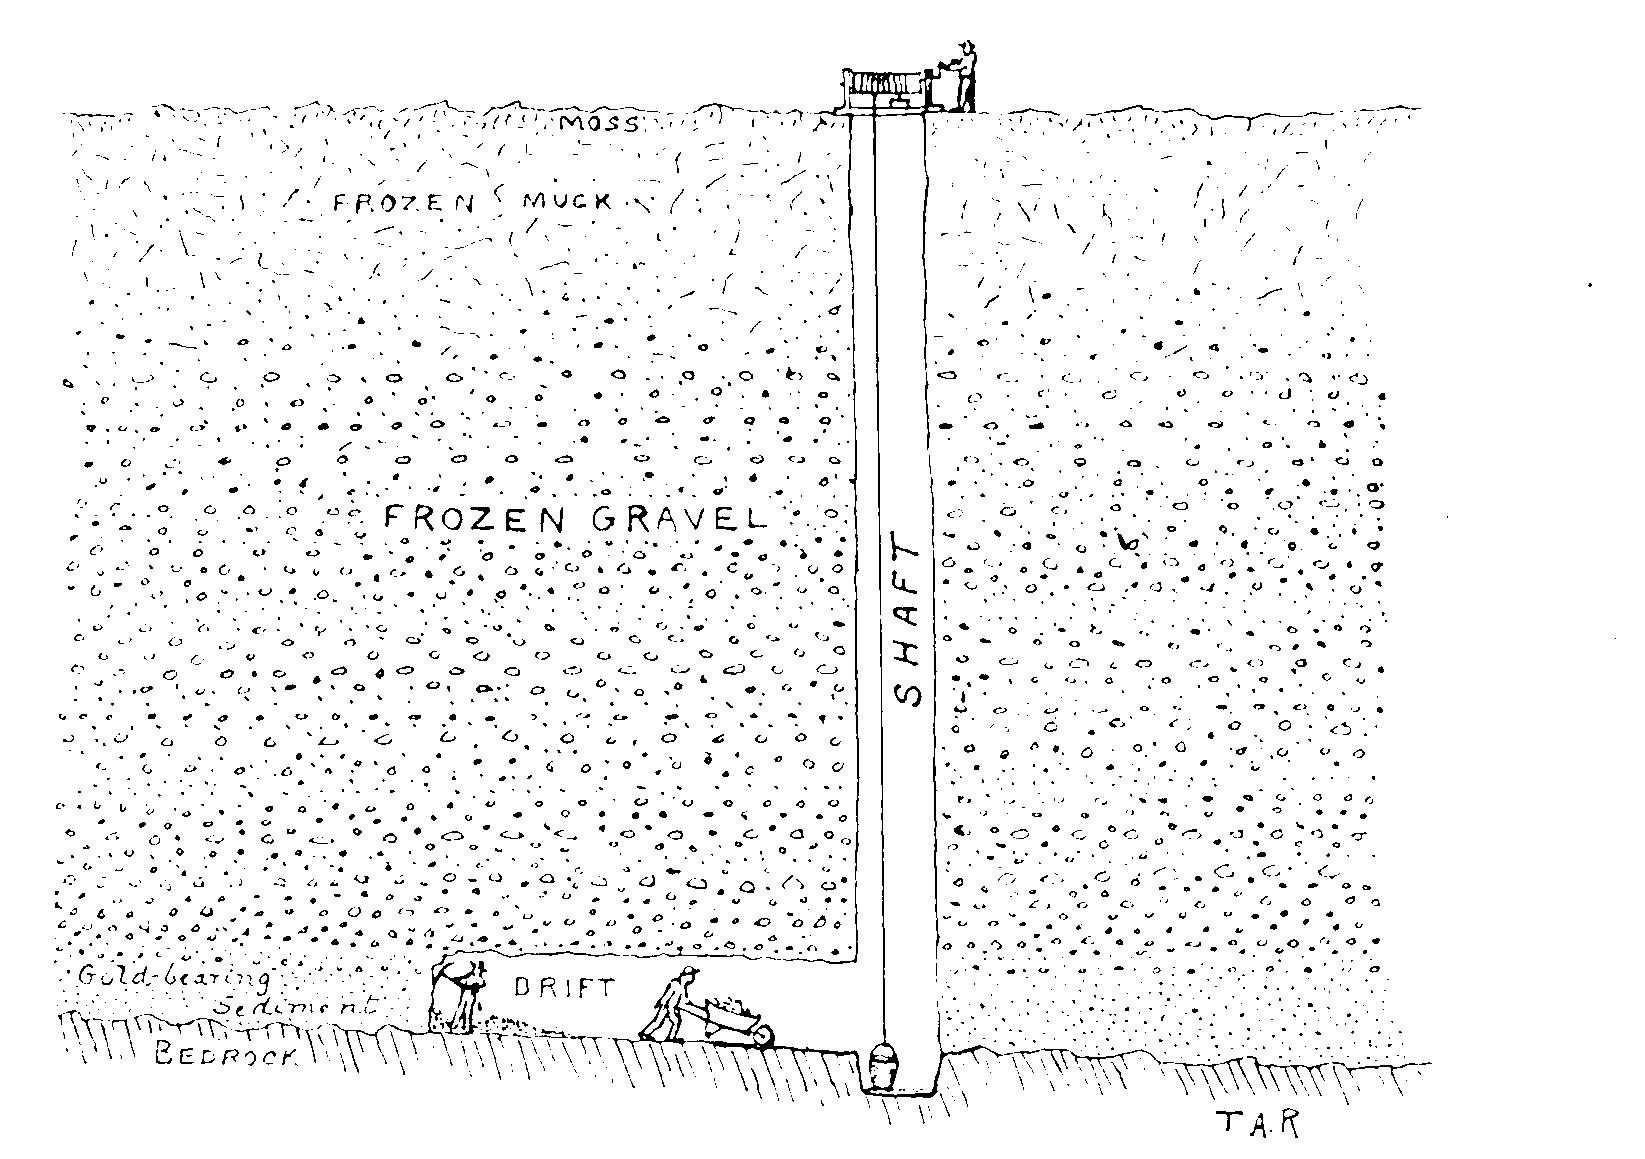 File:Drift mine diagram.PNG - Wikimedia Commons